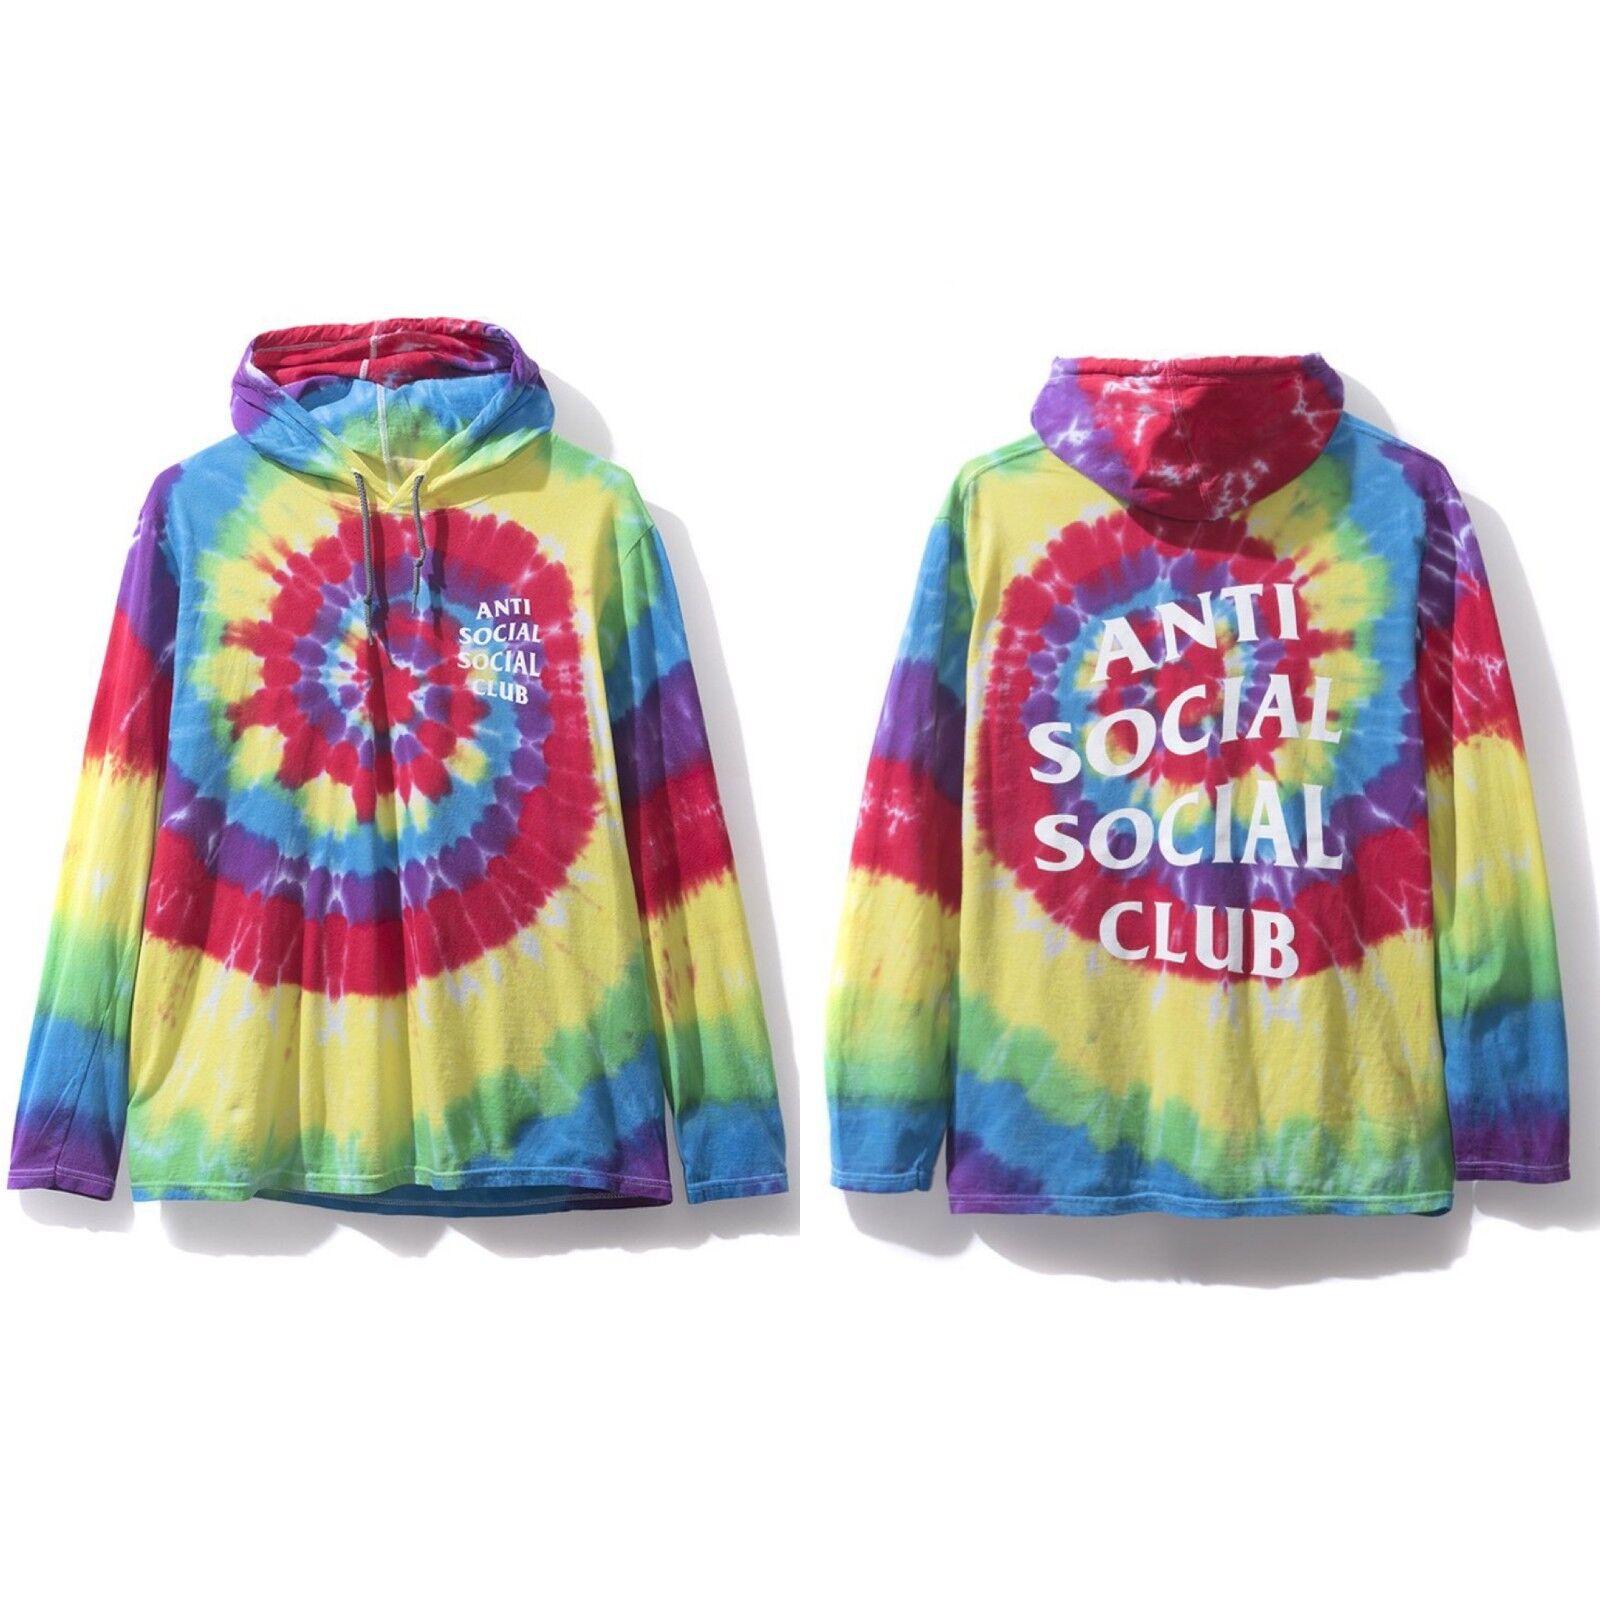 Anti Social Social Club Woodstock Longsleeve Hooded Tee S M L XL XXL